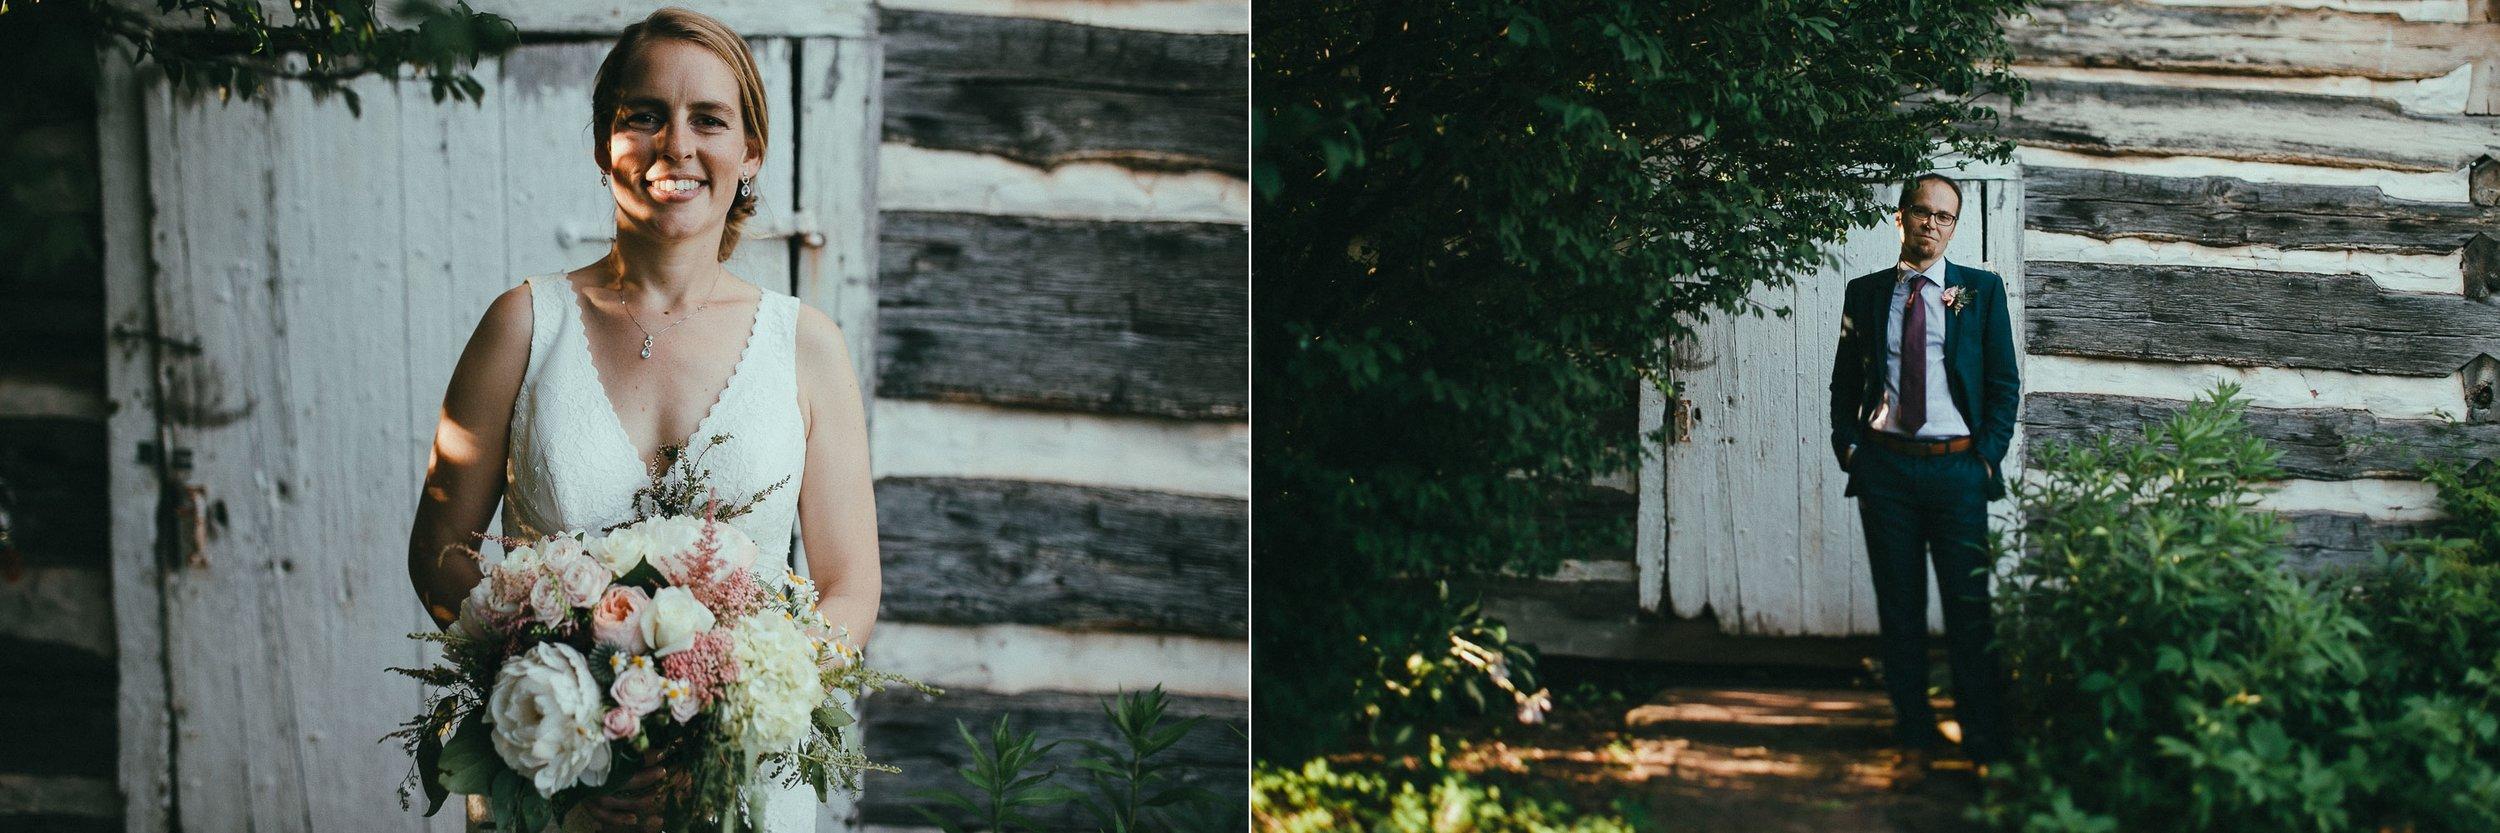 washington-wedding-photographer (51).jpg